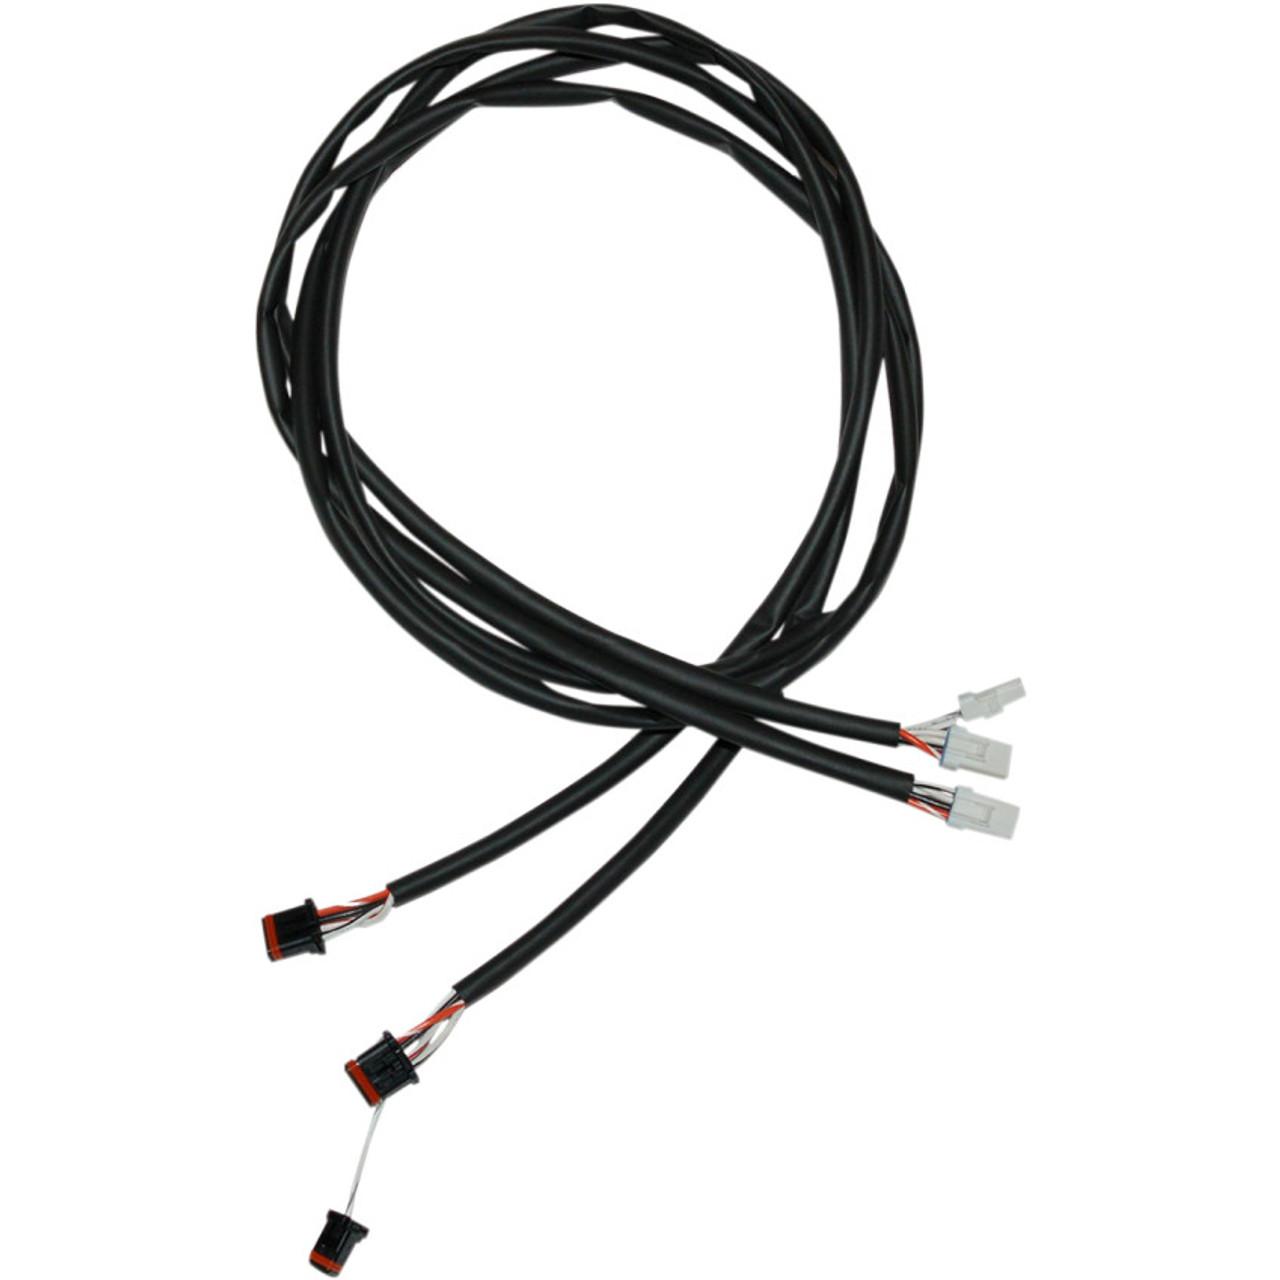 namz handlebar extension wiring harness for 2014 2018 harley touring harley throttle by wire extension in addition harley davidson wiring [ 1280 x 1280 Pixel ]